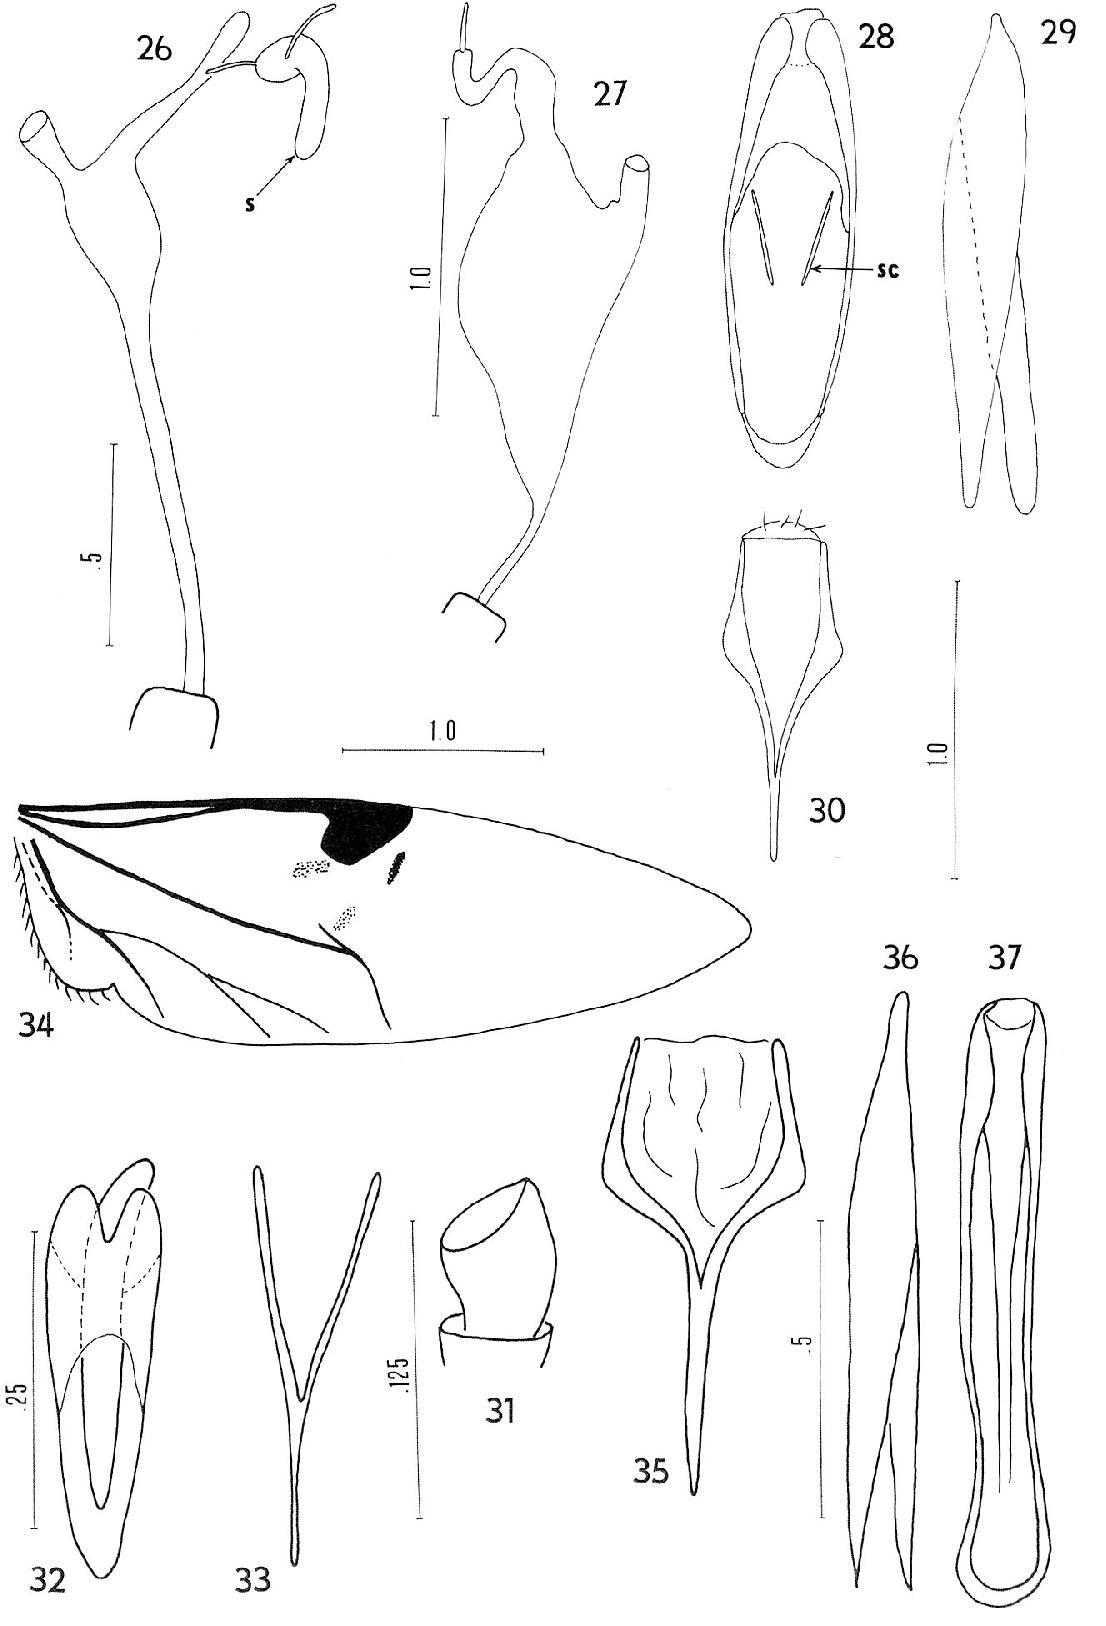 figure 26-37